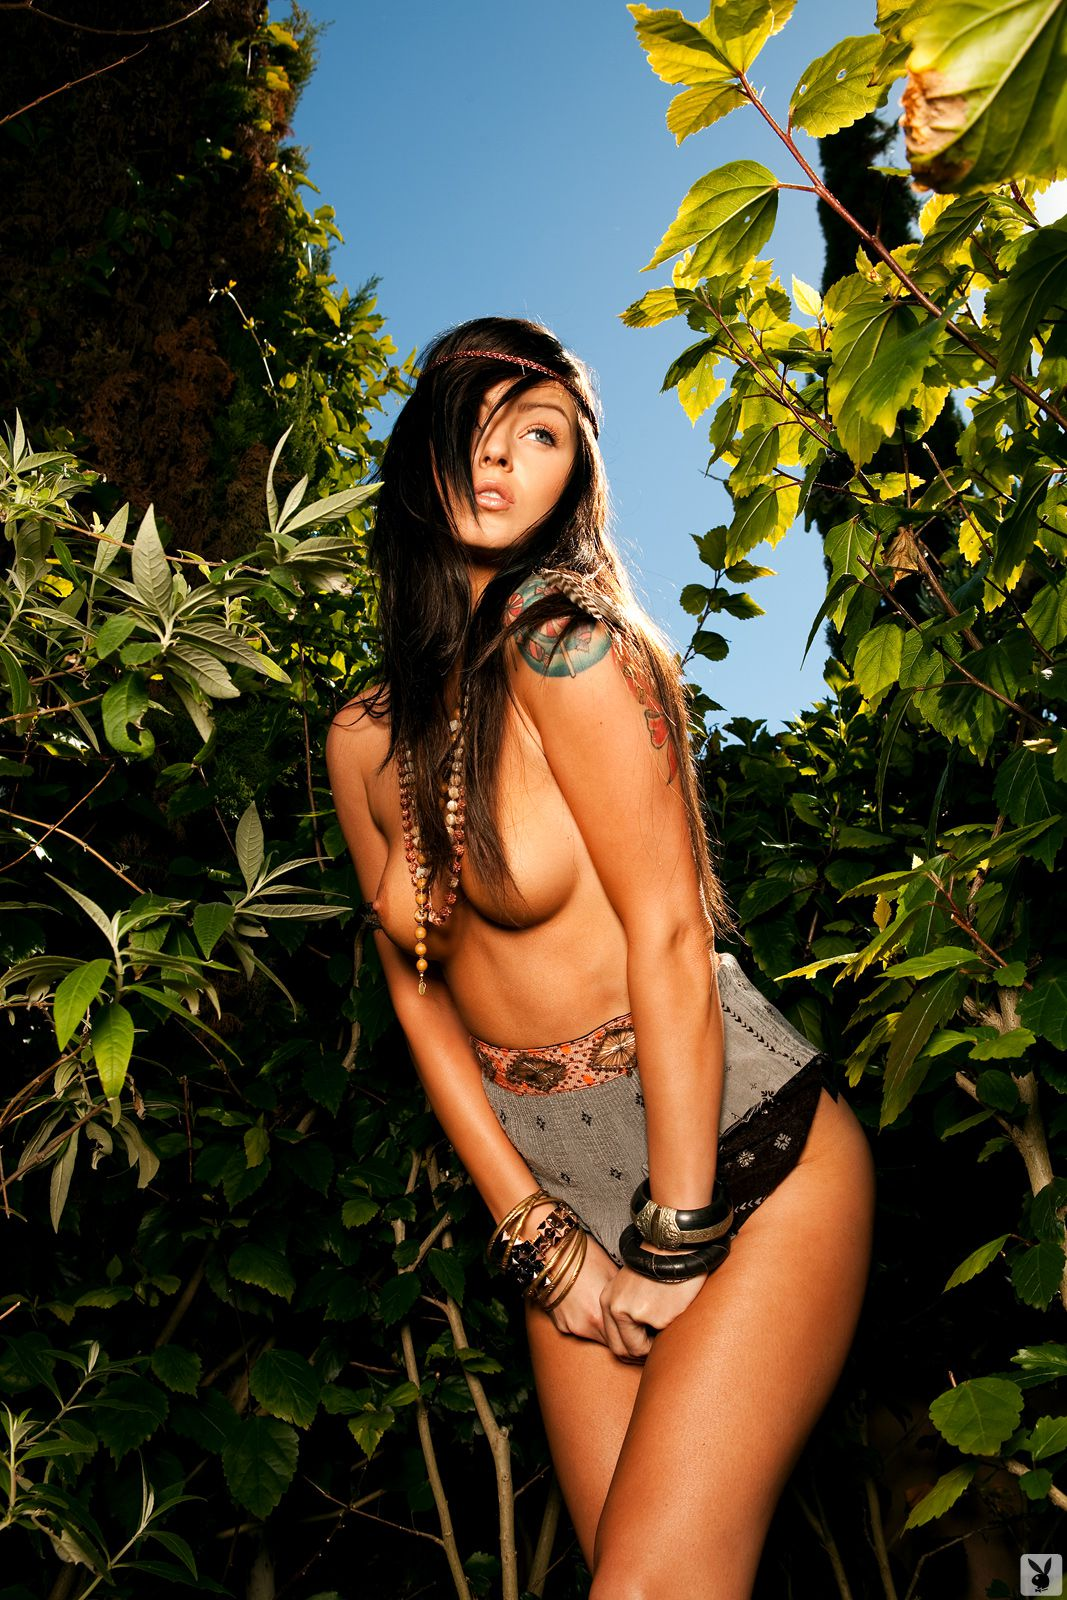 Veronica_LaVery (33)